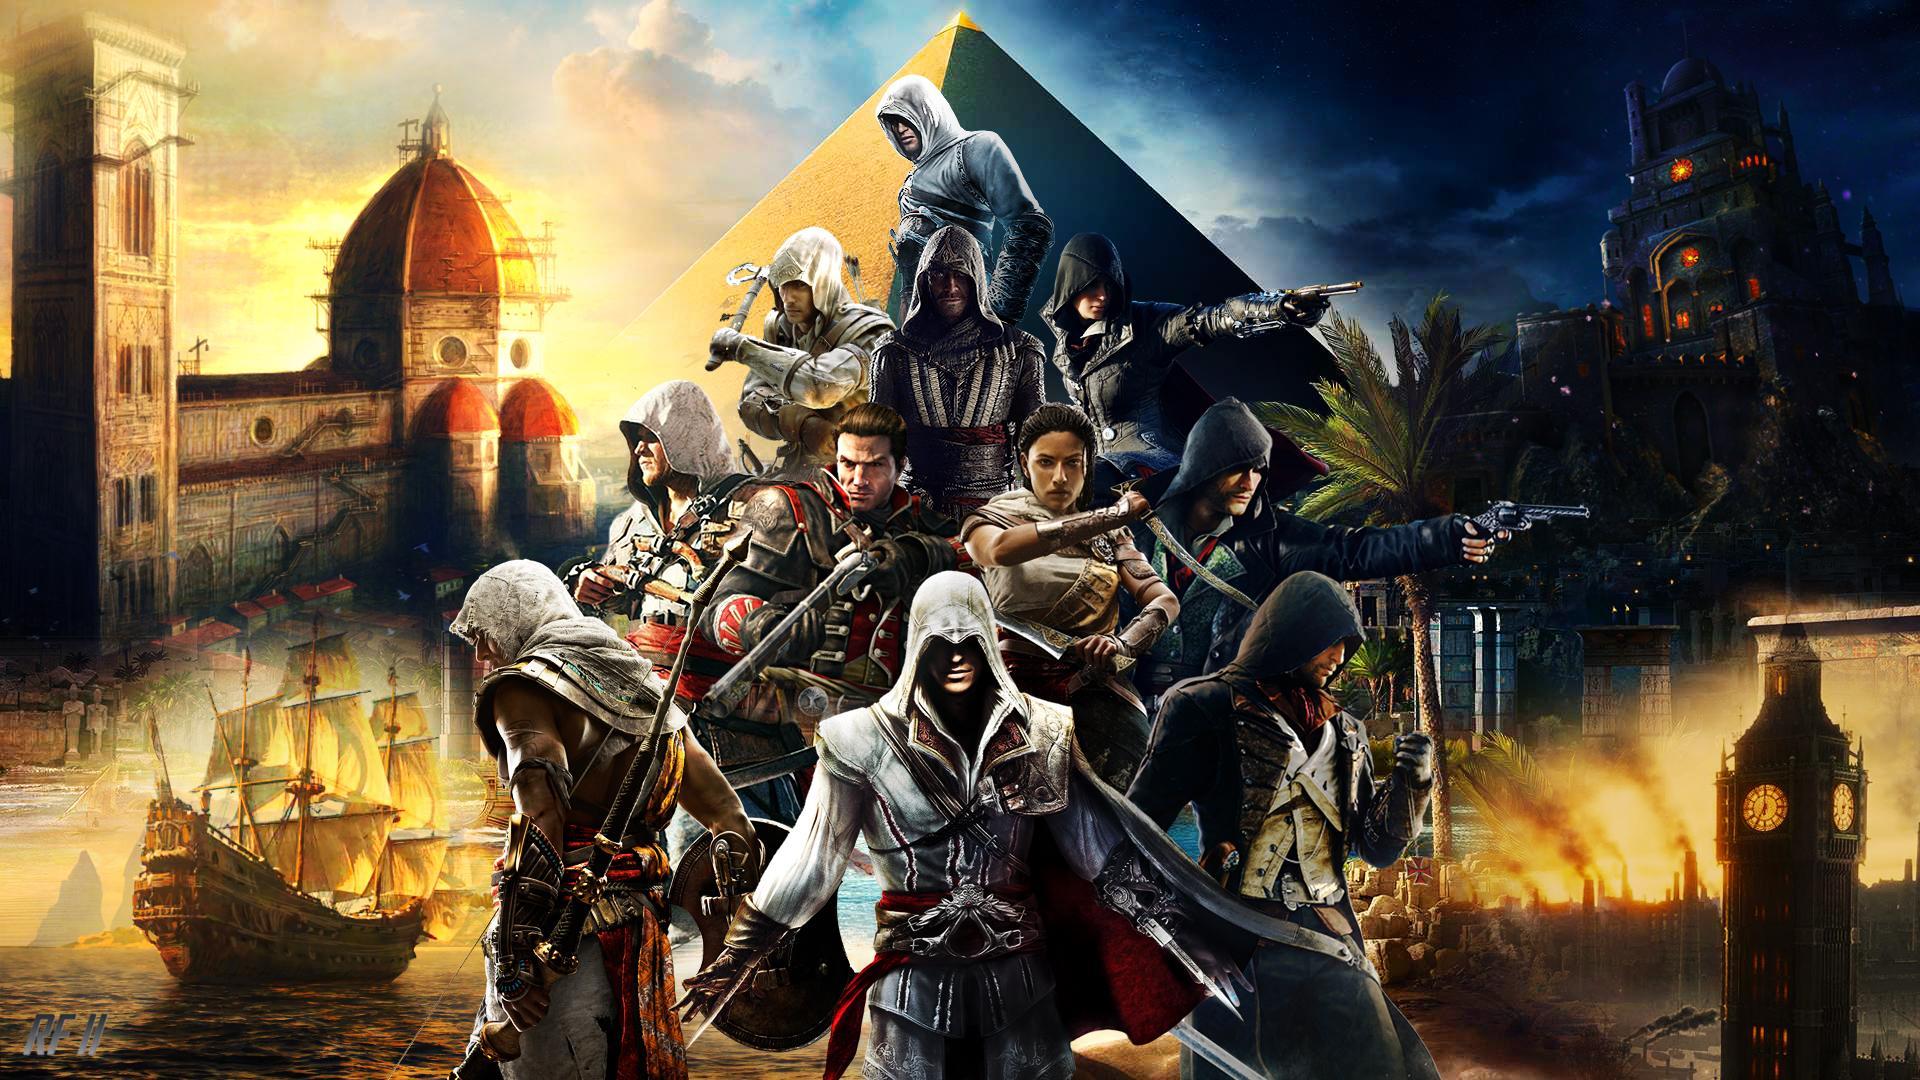 Assassins Creed Odyssey hd wallpaper (70 Wallpapers ...